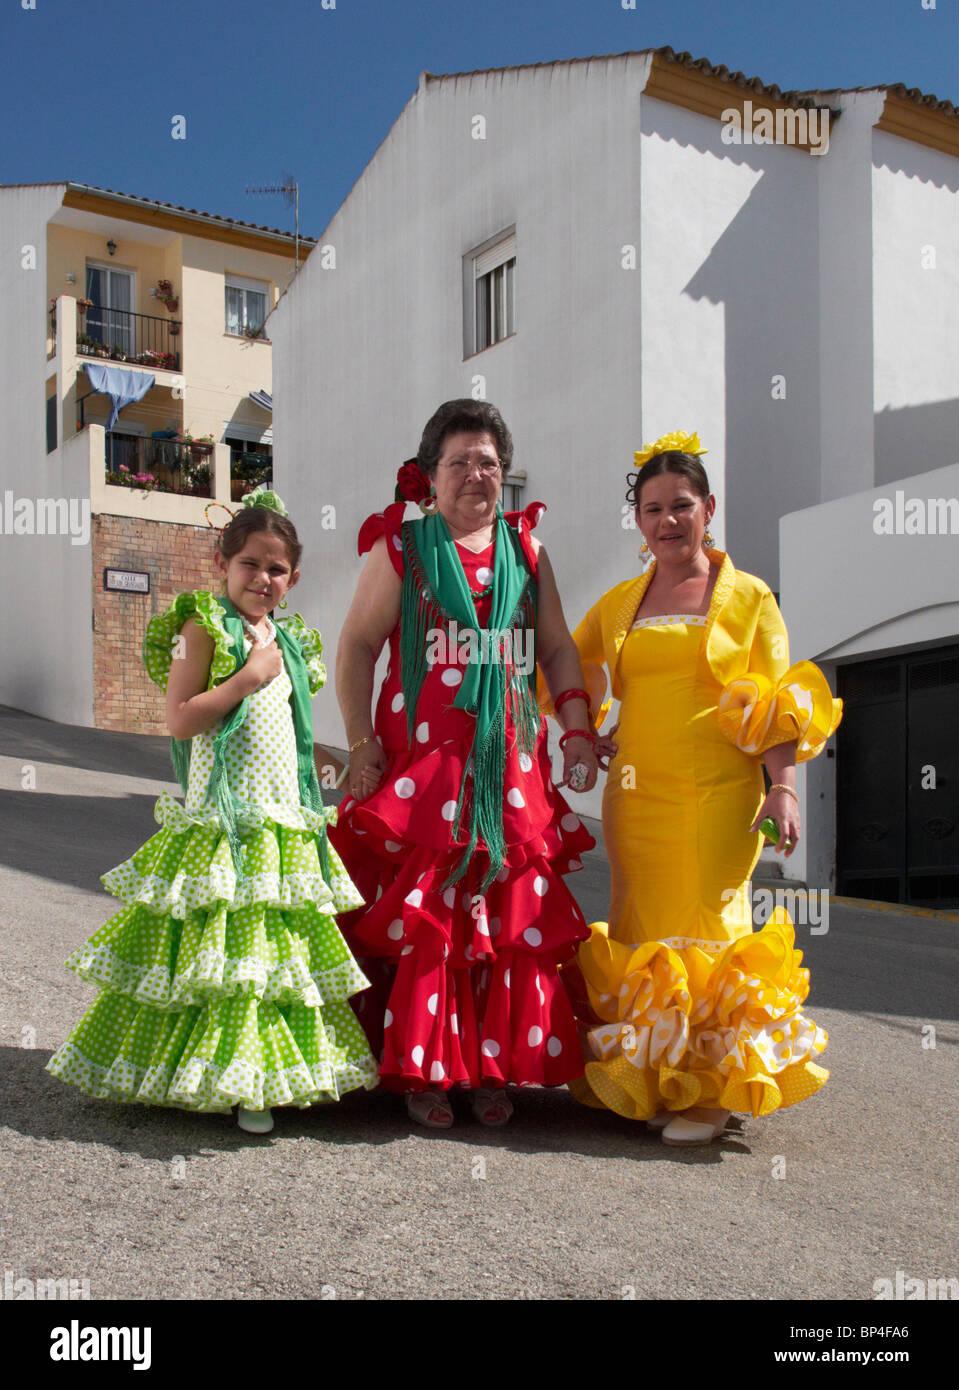 aeb167d91ec5 Women in traditional flamenco dress. Prado del Rey, Sierra de Cadiz,  Andalucia, Spain.